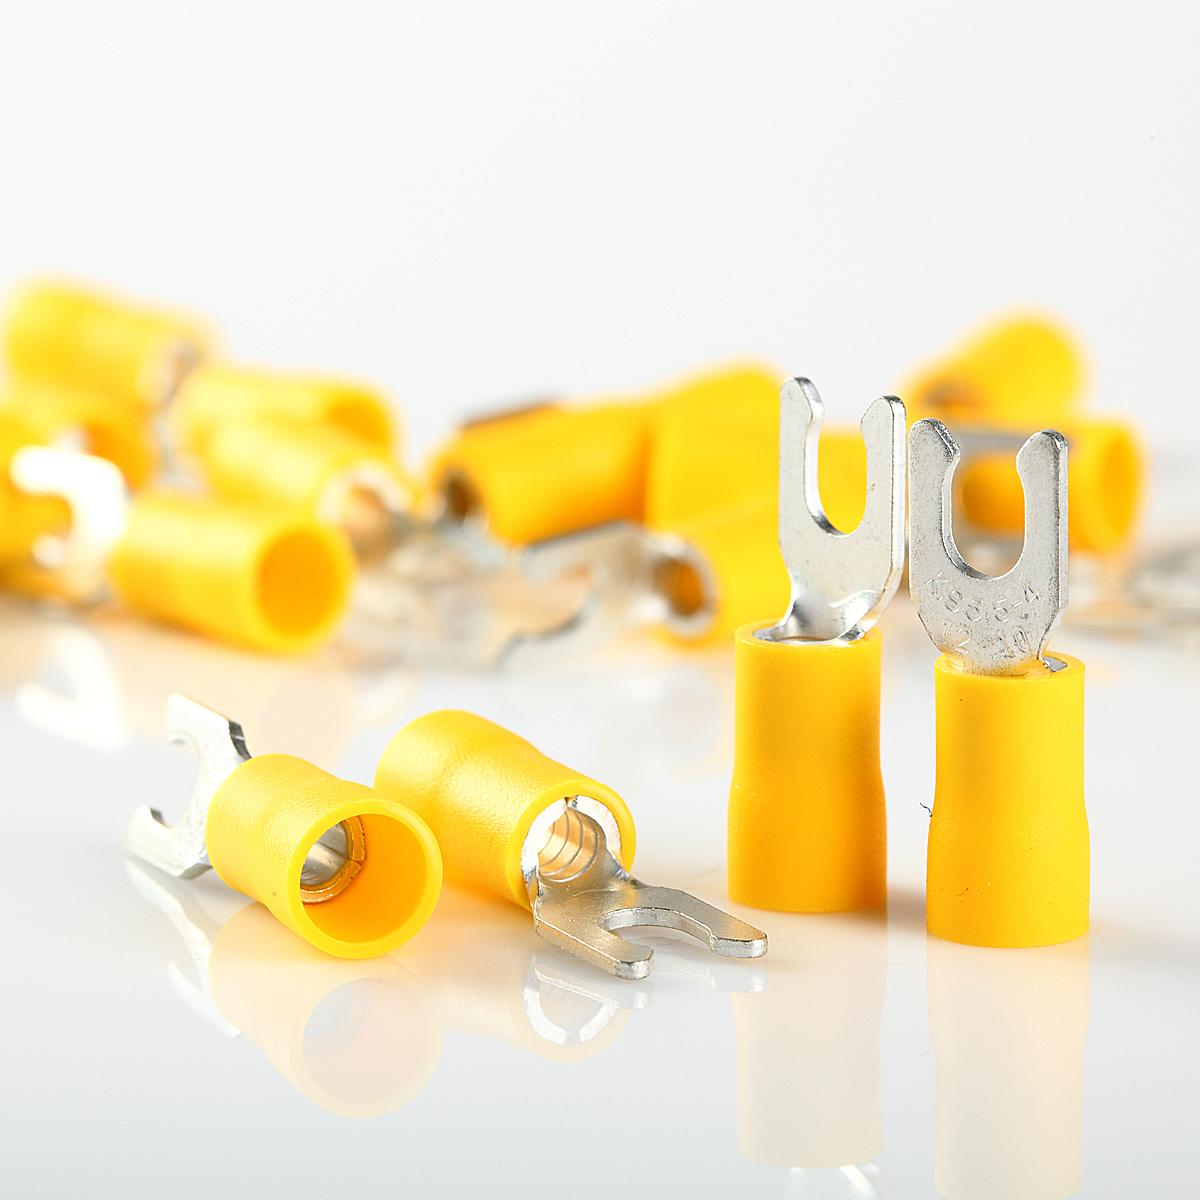 #10 Yellow Vinyl Insulated Fork//Spade Terminal Connectors 12-10 GAUGE